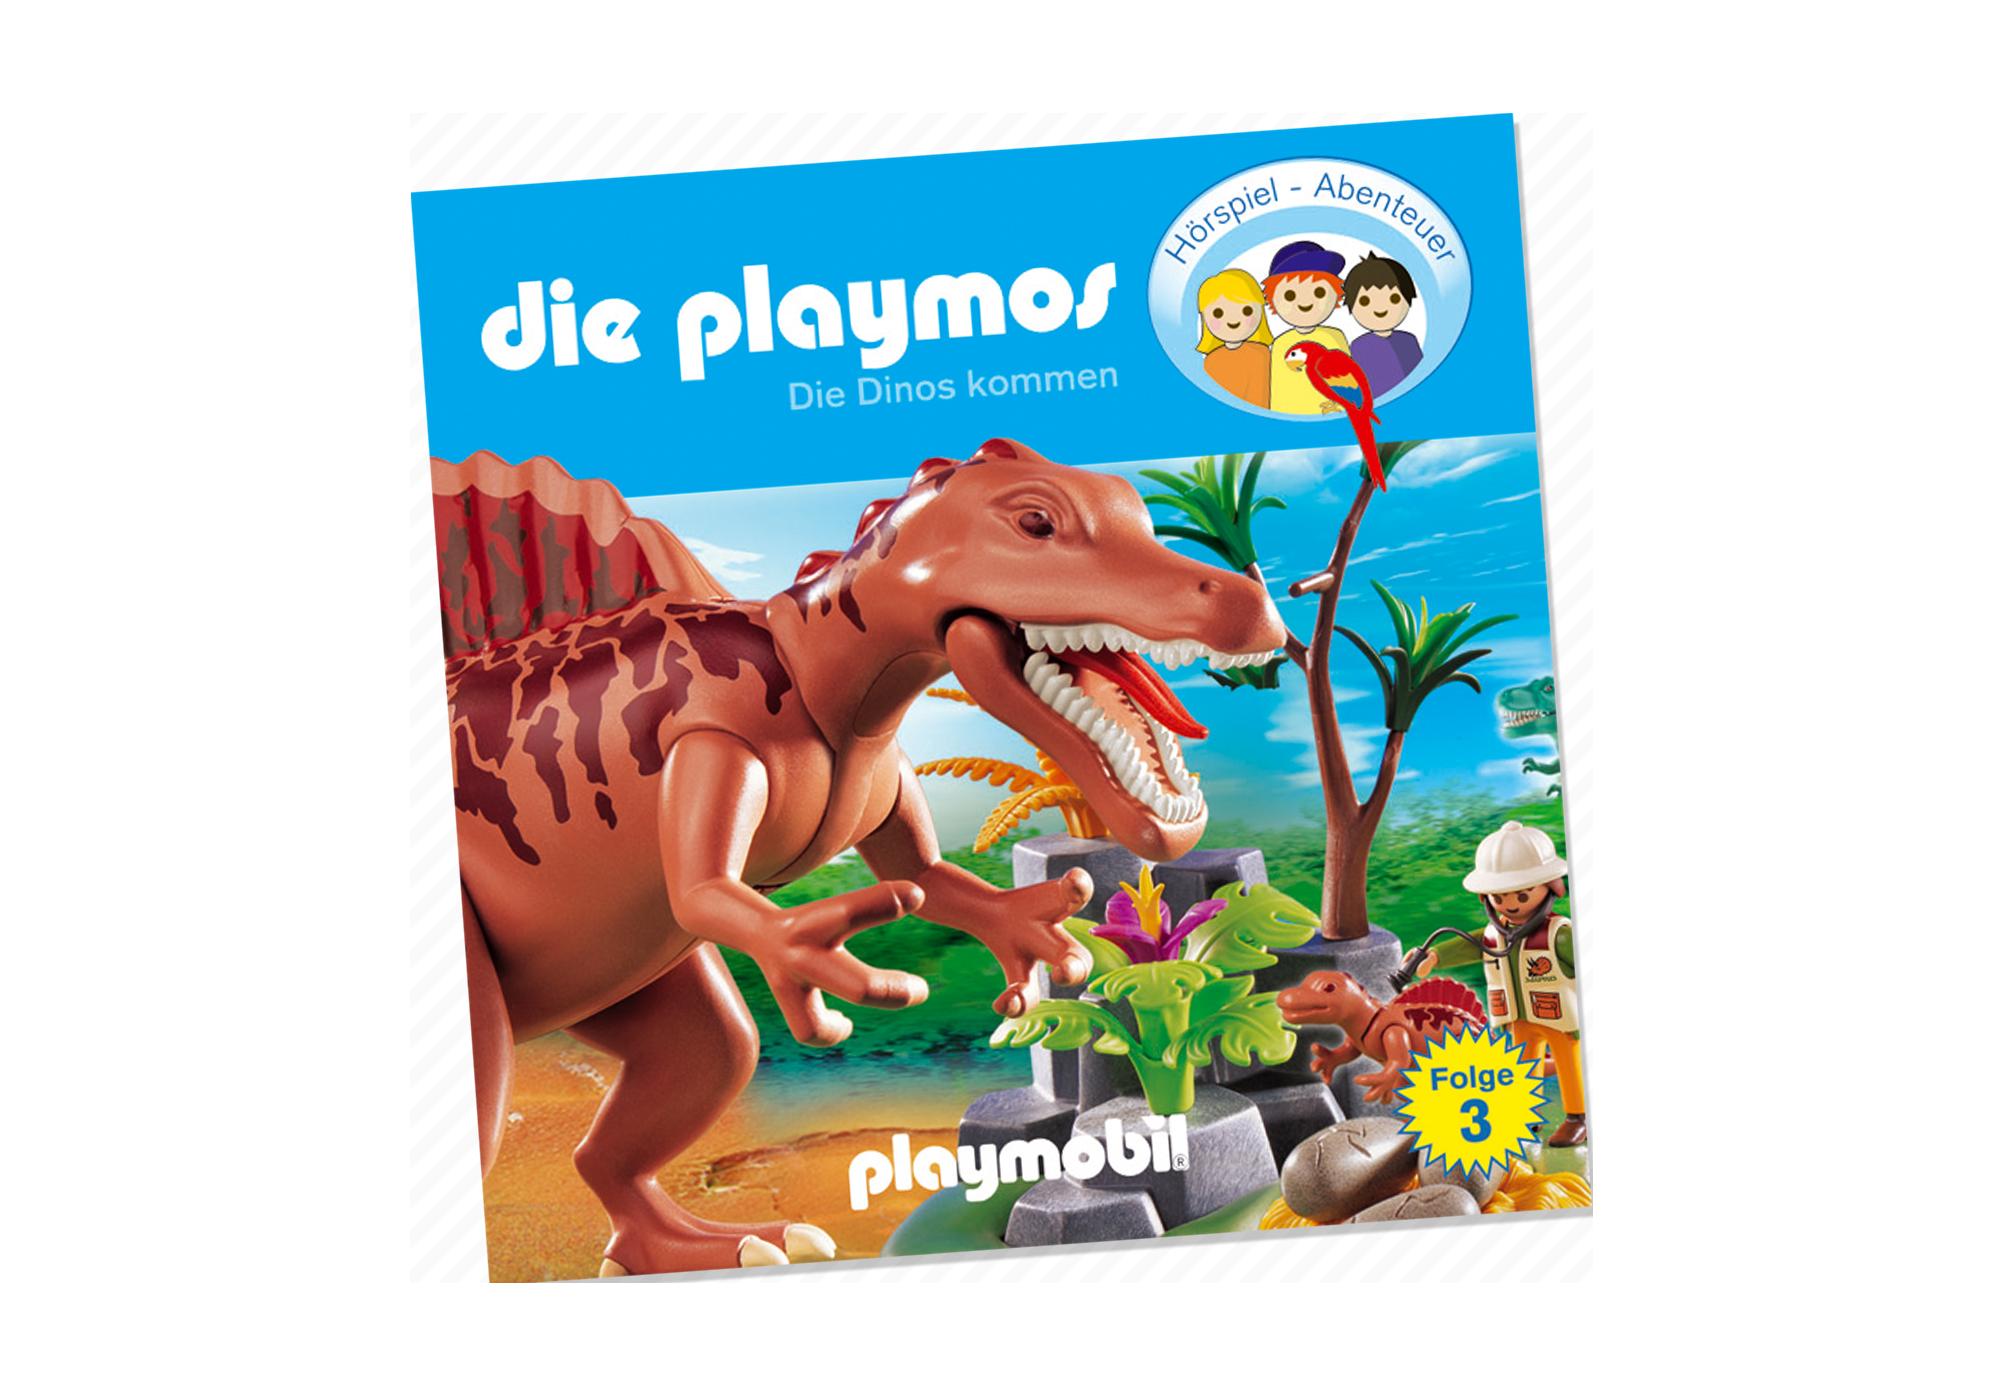 http://media.playmobil.com/i/playmobil/80132_product_detail